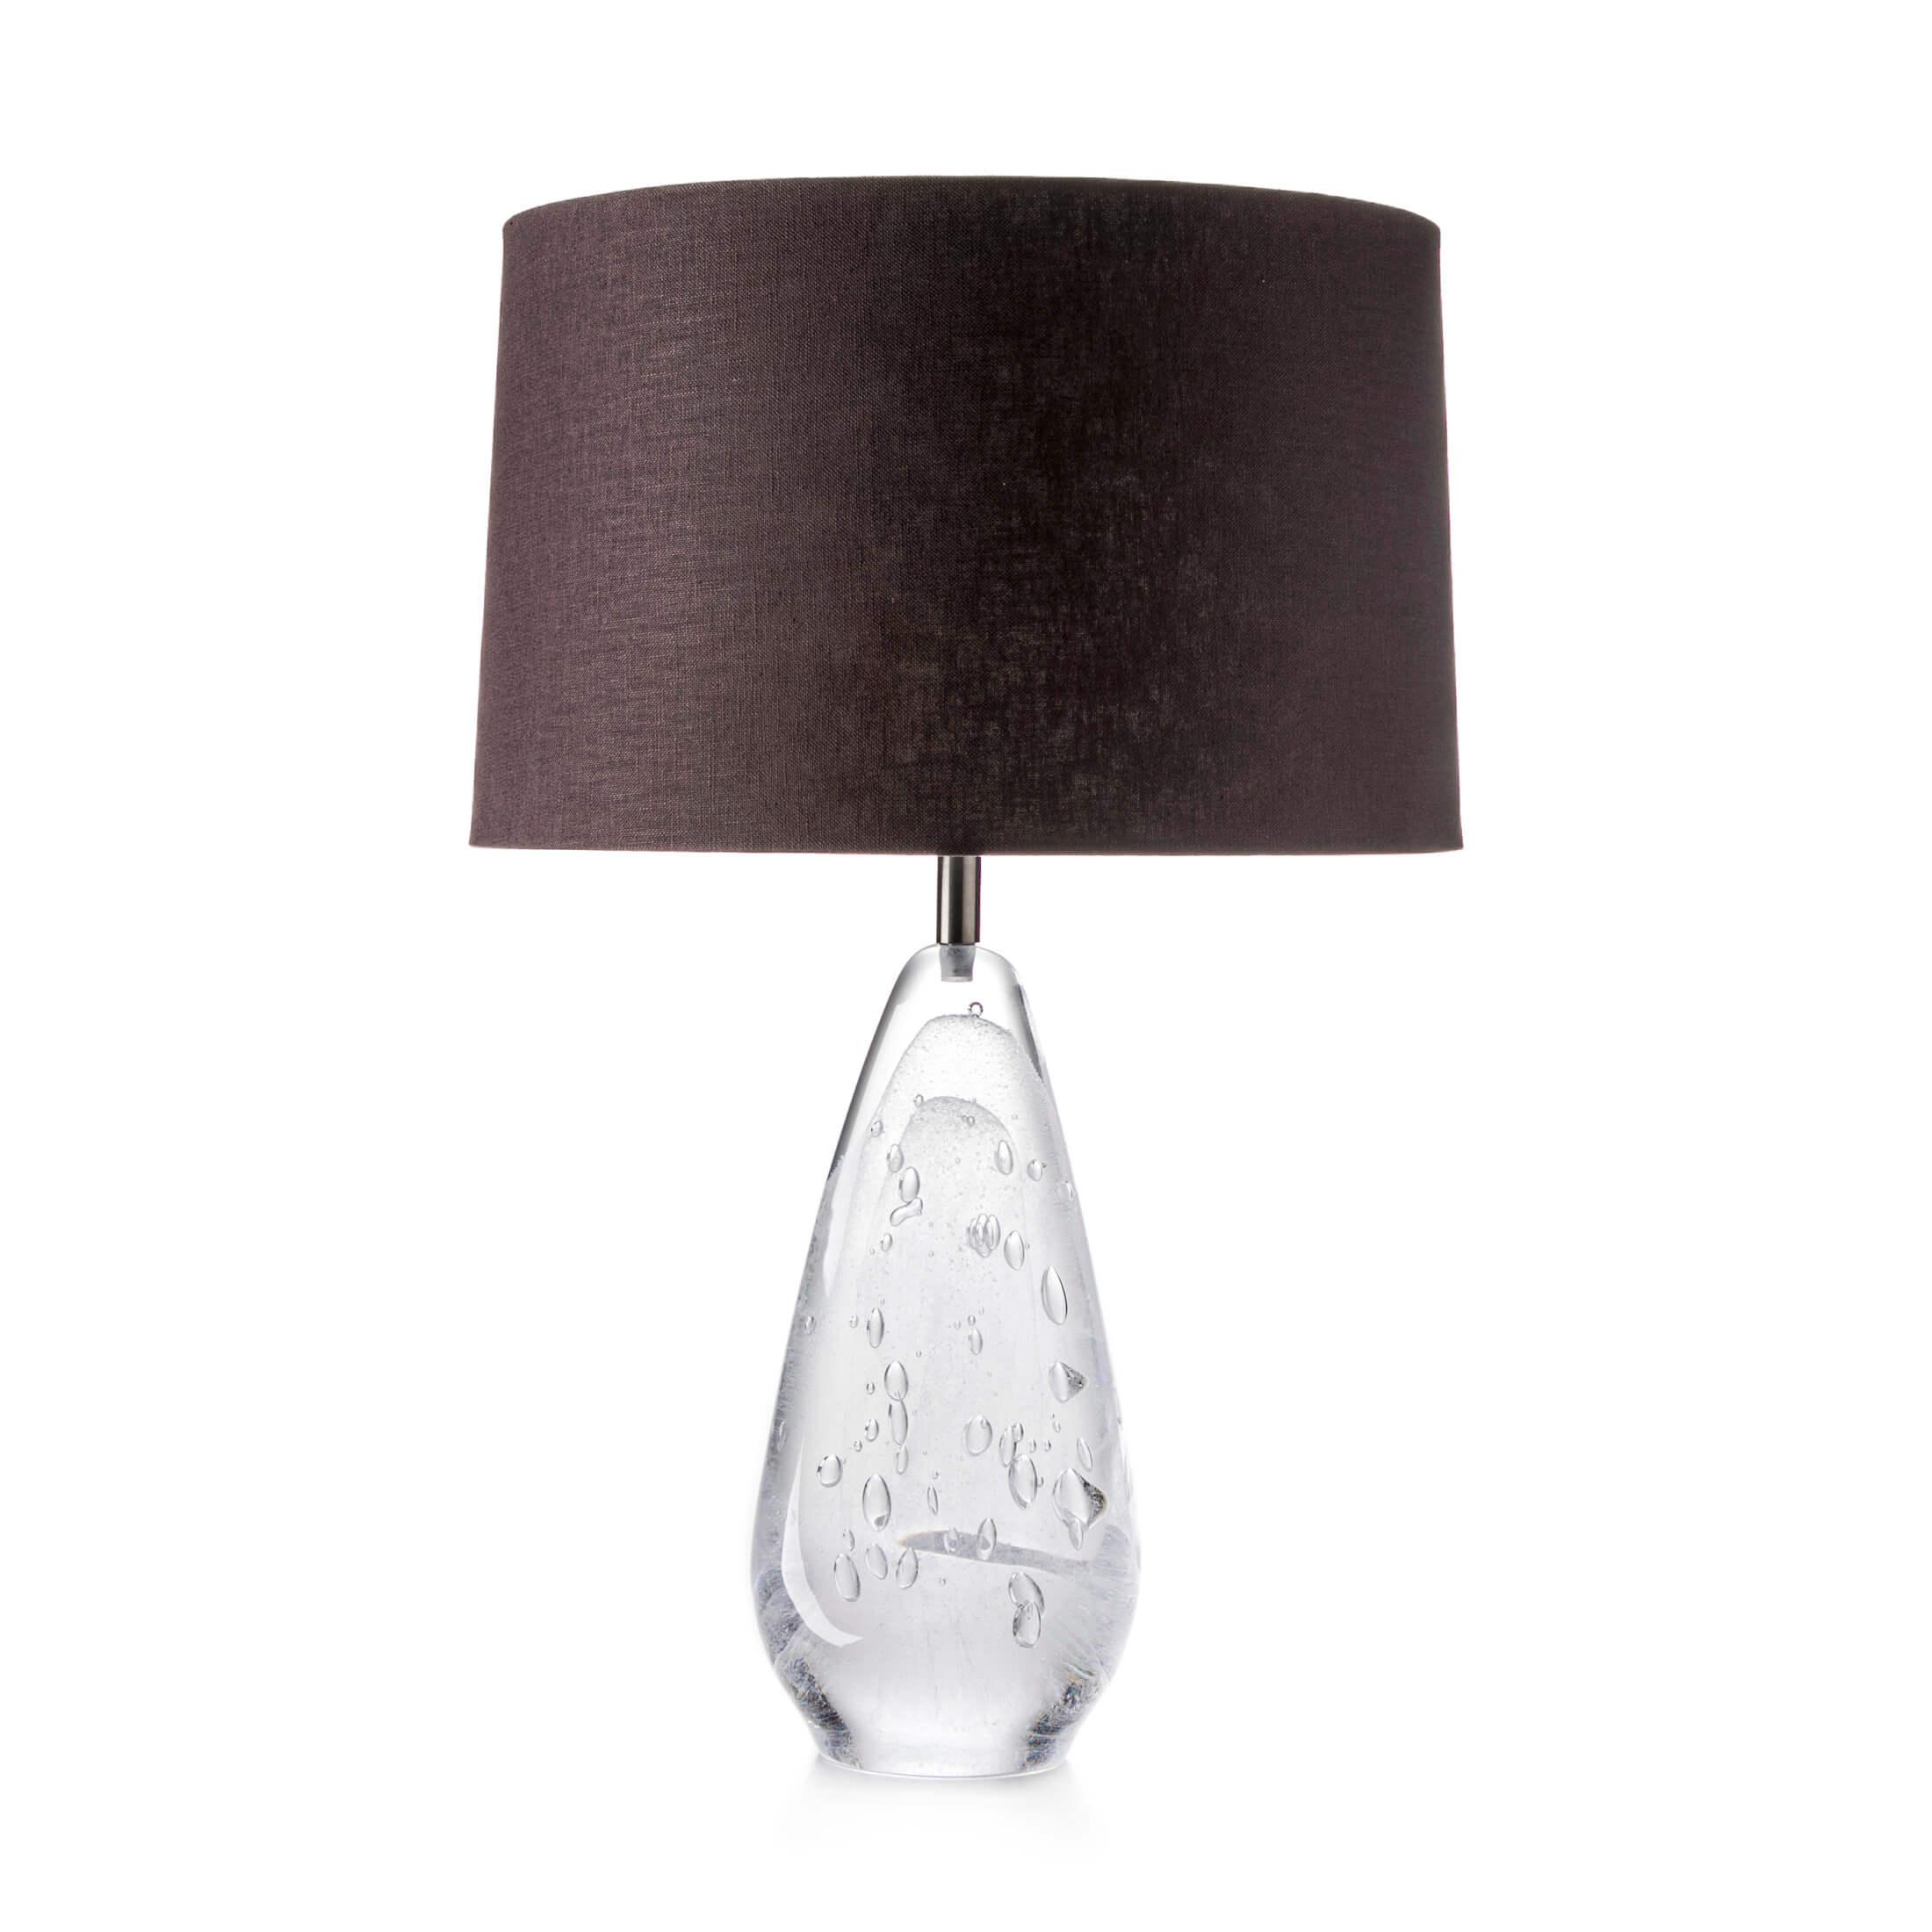 Handblown glass lamps pendant lights simon pearce lyra lamp arubaitofo Images